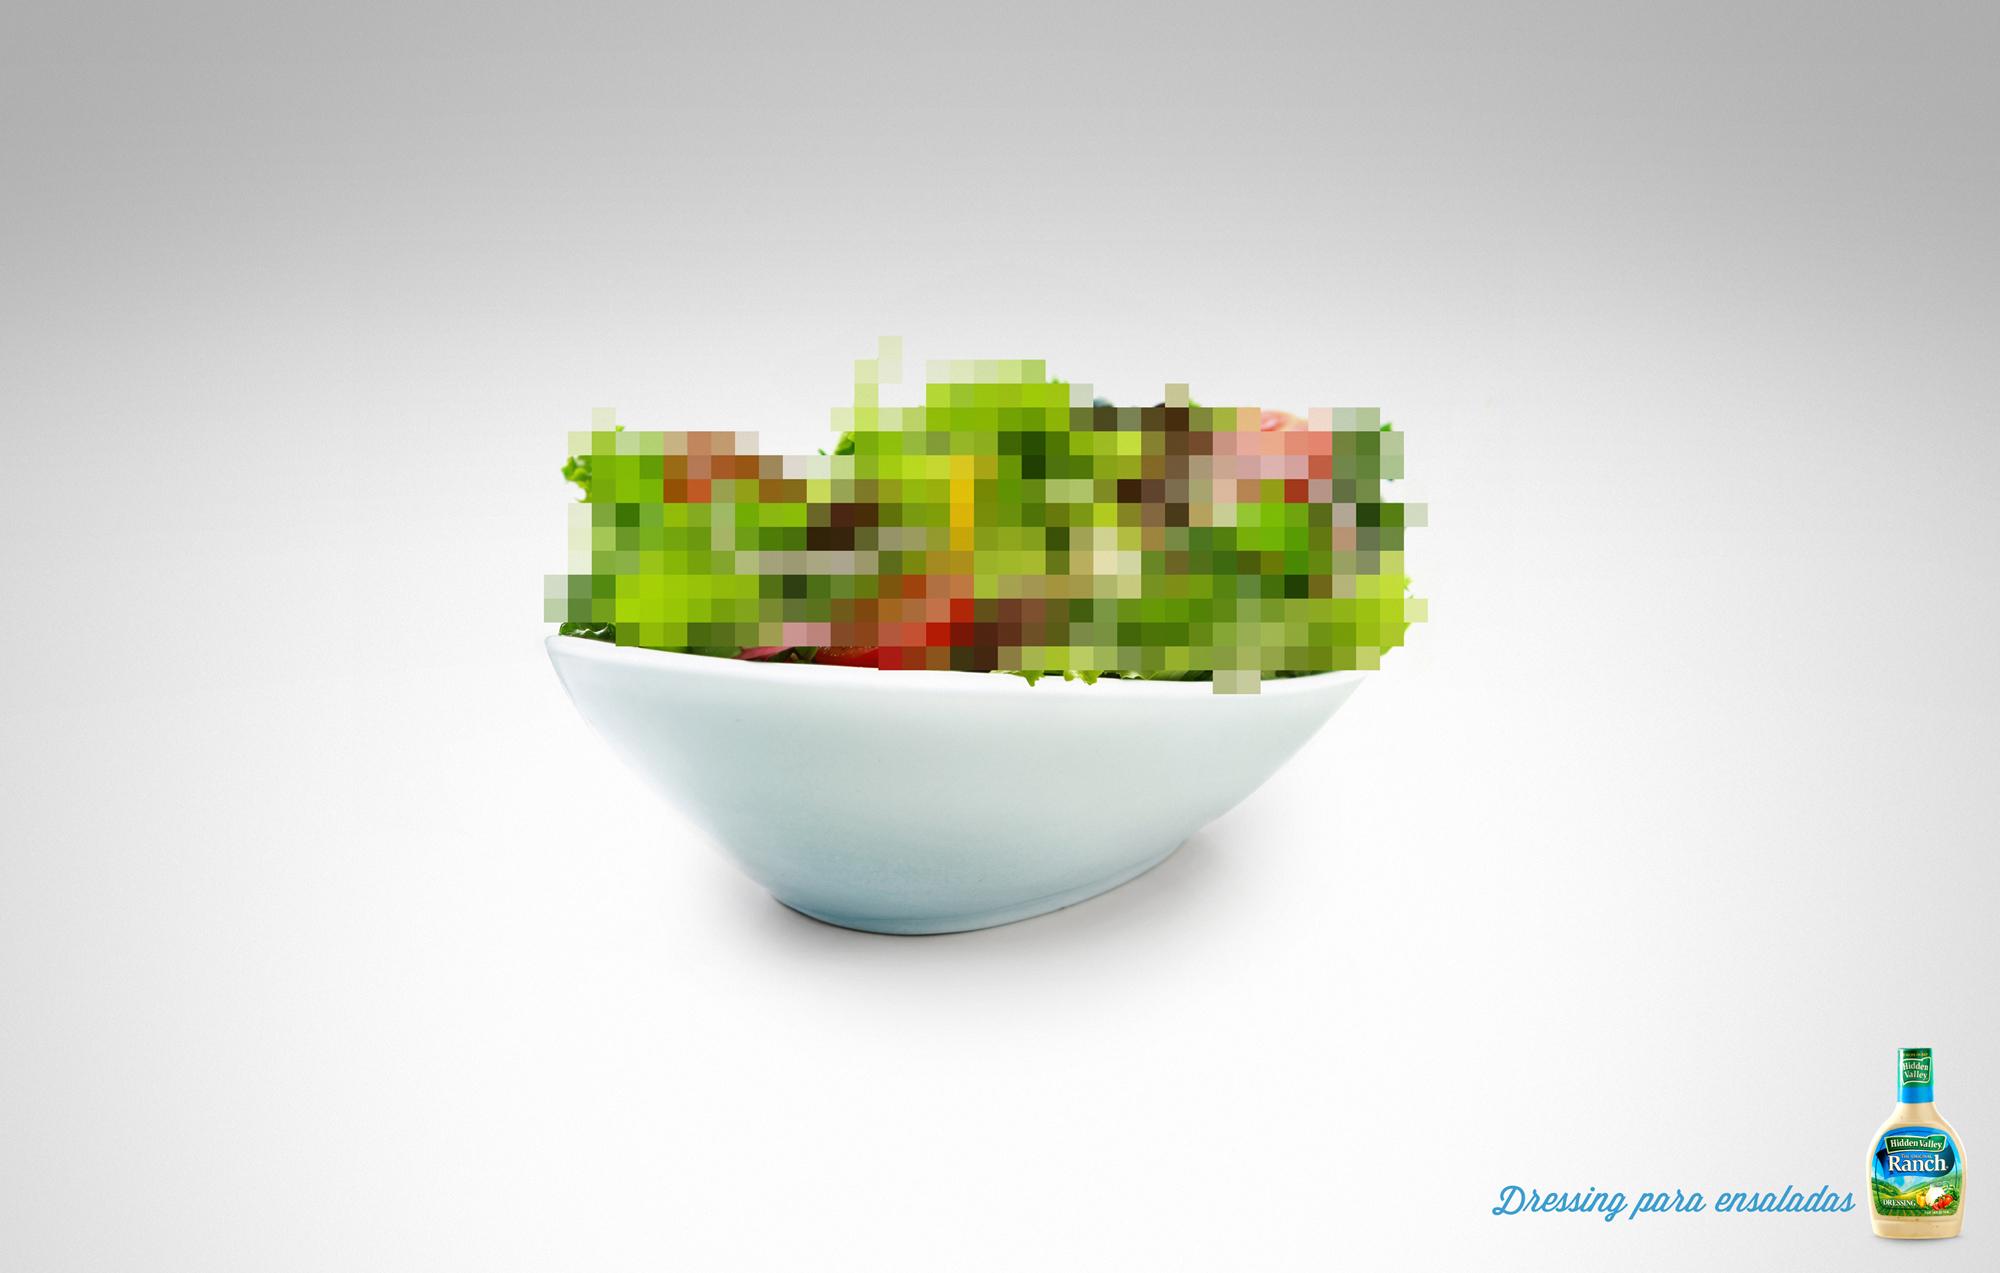 HiddenRanch_DressIt_Salad.jpg